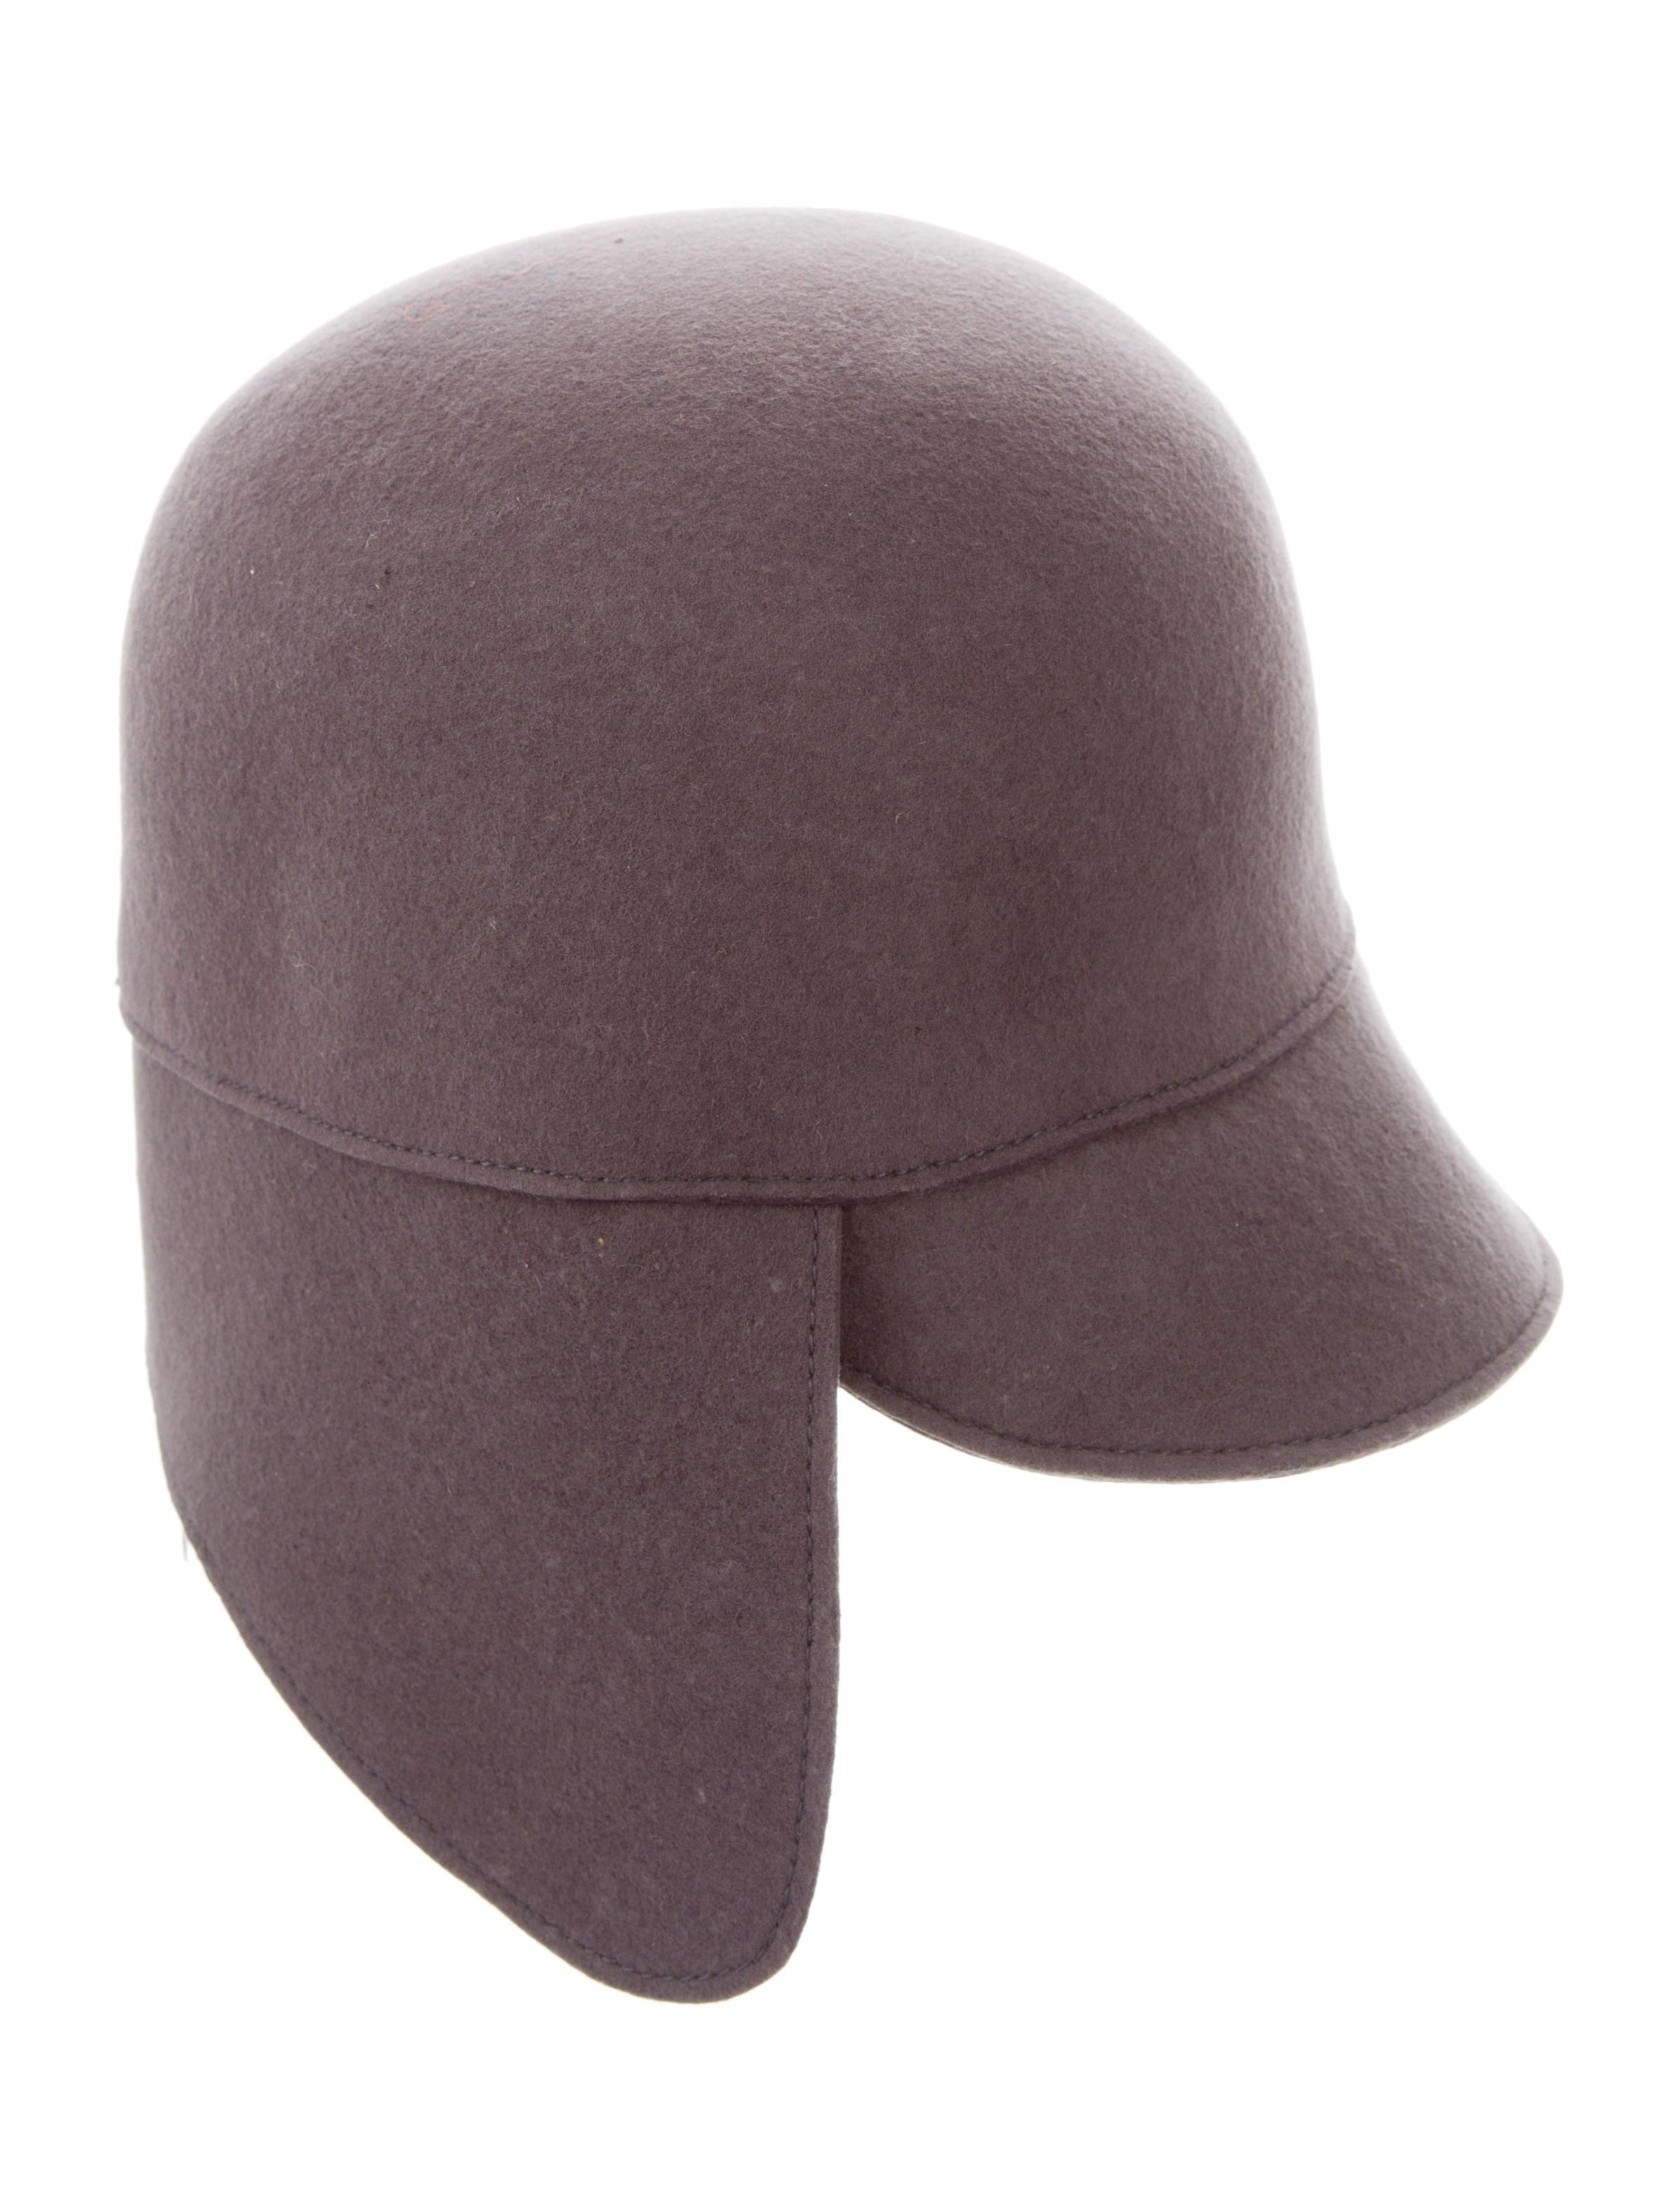 Accessories - Hats Maison Martin Margiela takkuuq